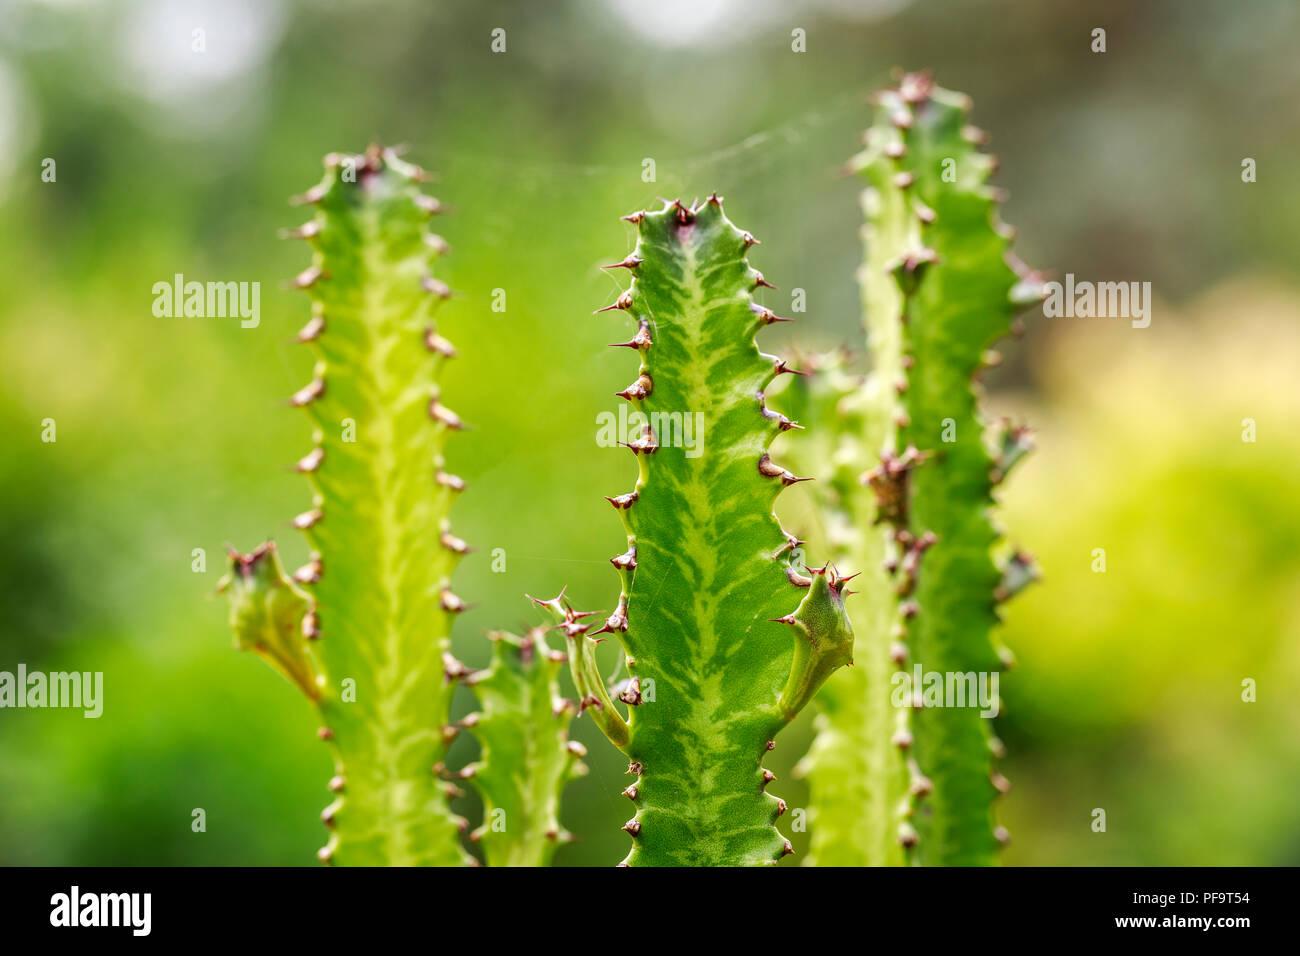 Jade Tiger Cactus, Euphorbia trigona, close up - Stock Image